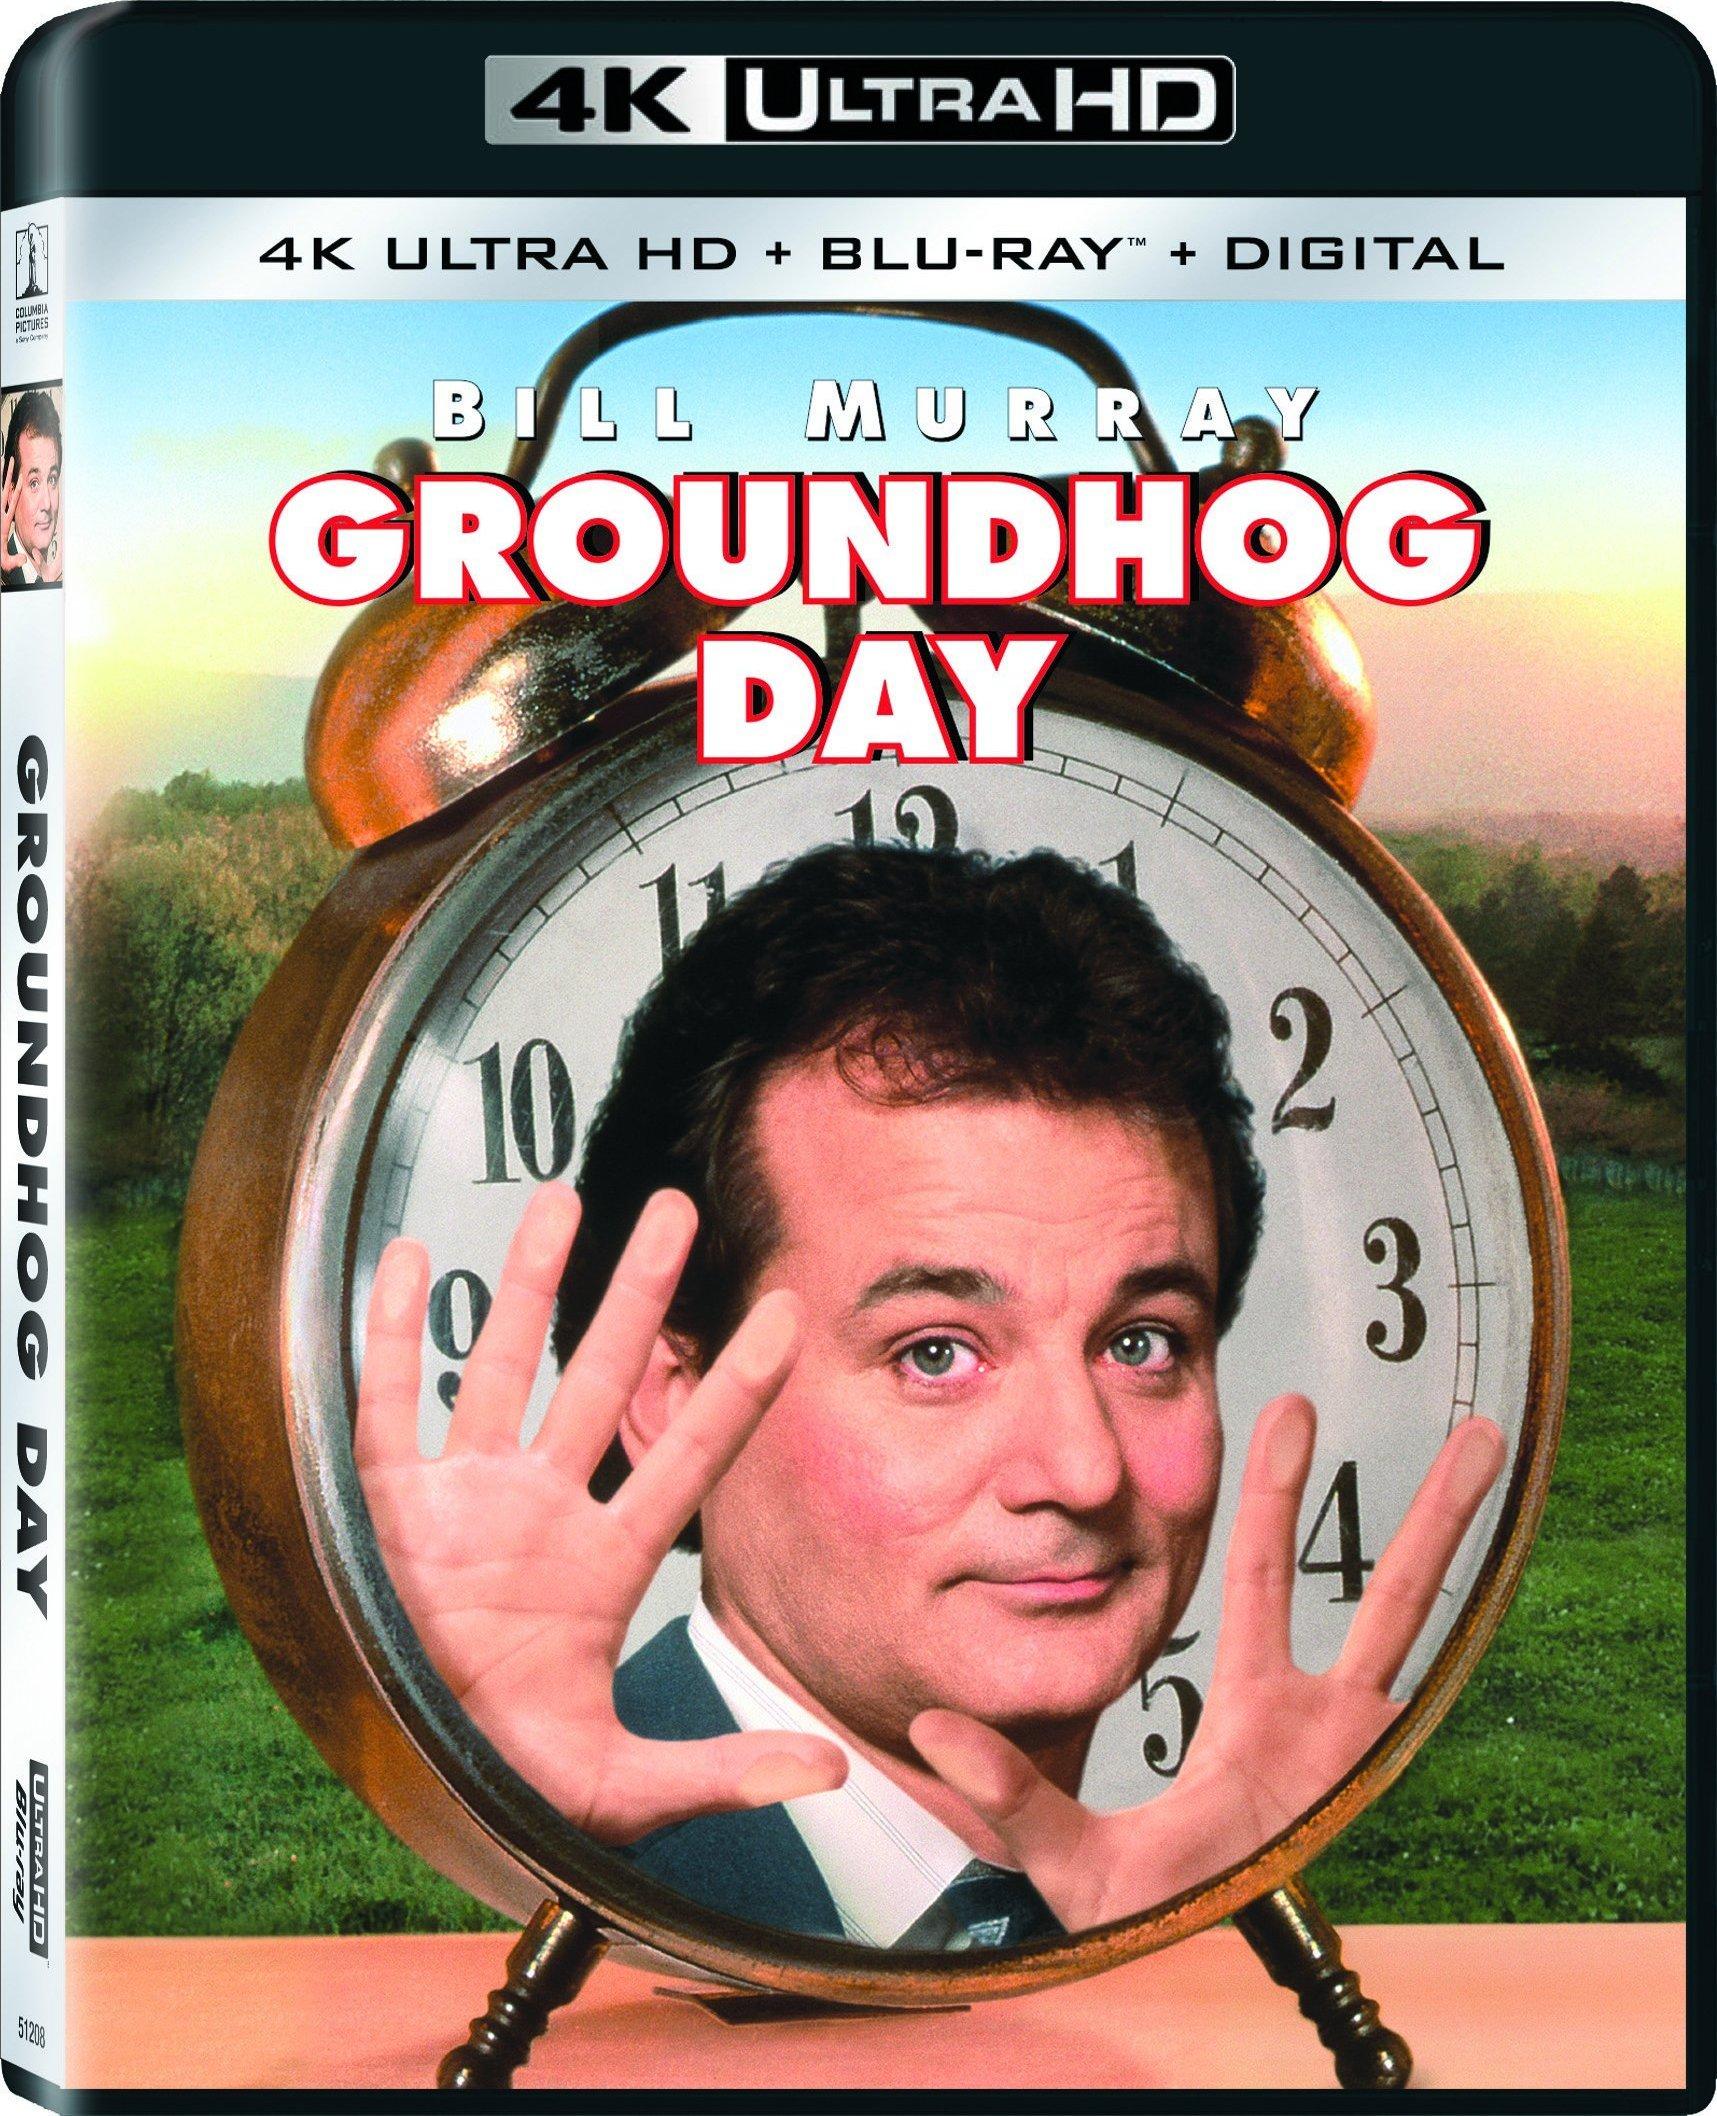 Groundhog Day 4K (1993) UHD Ultra HD Blu-ray